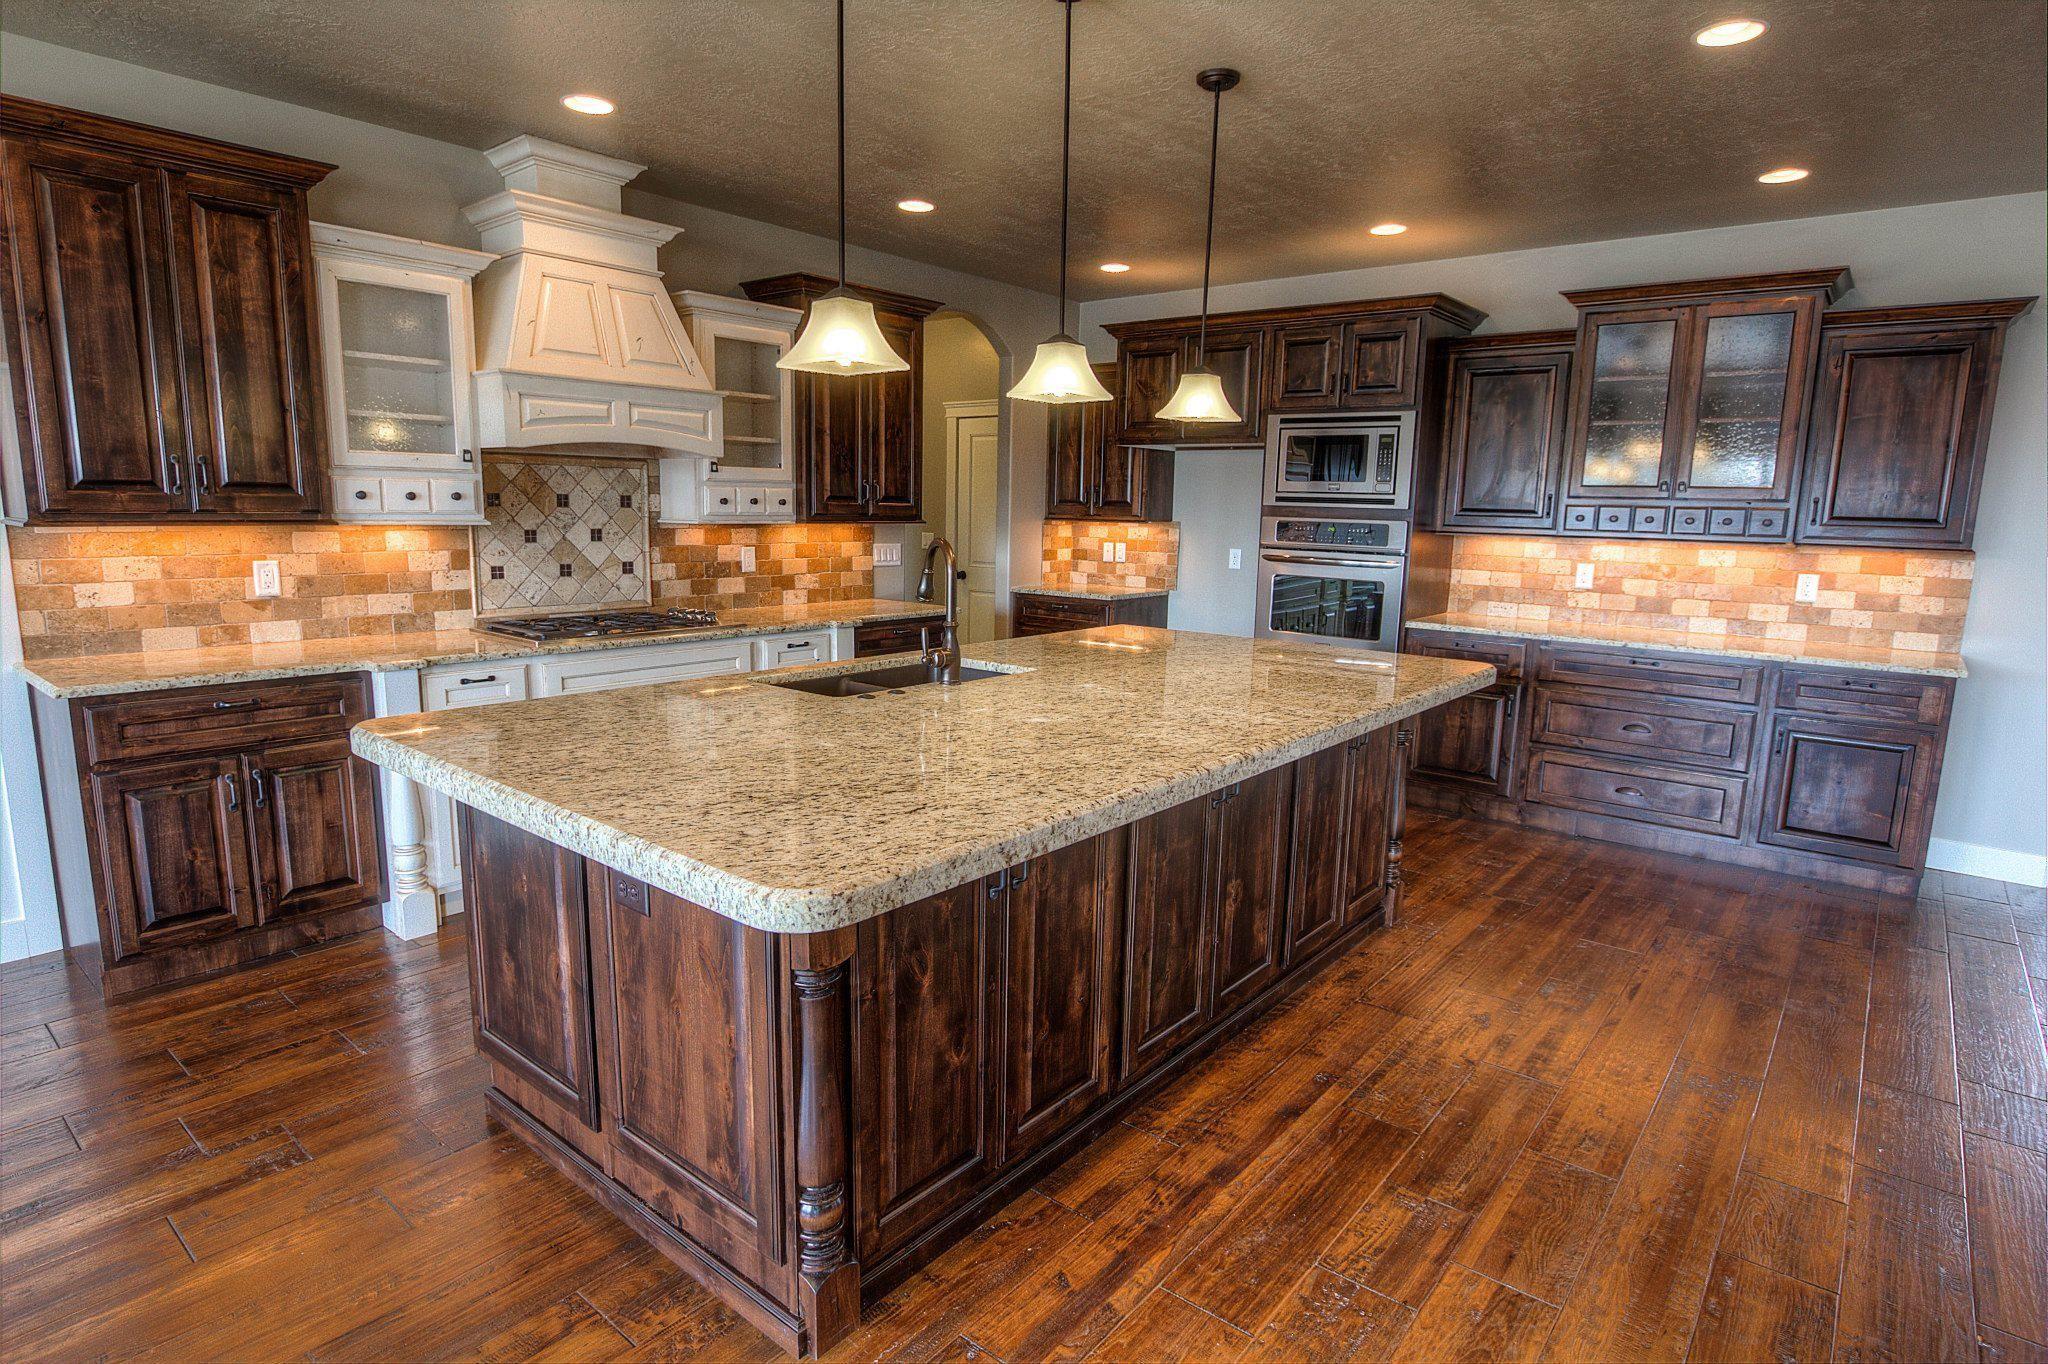 Custom mirage located in davis county utah custom kitchen with